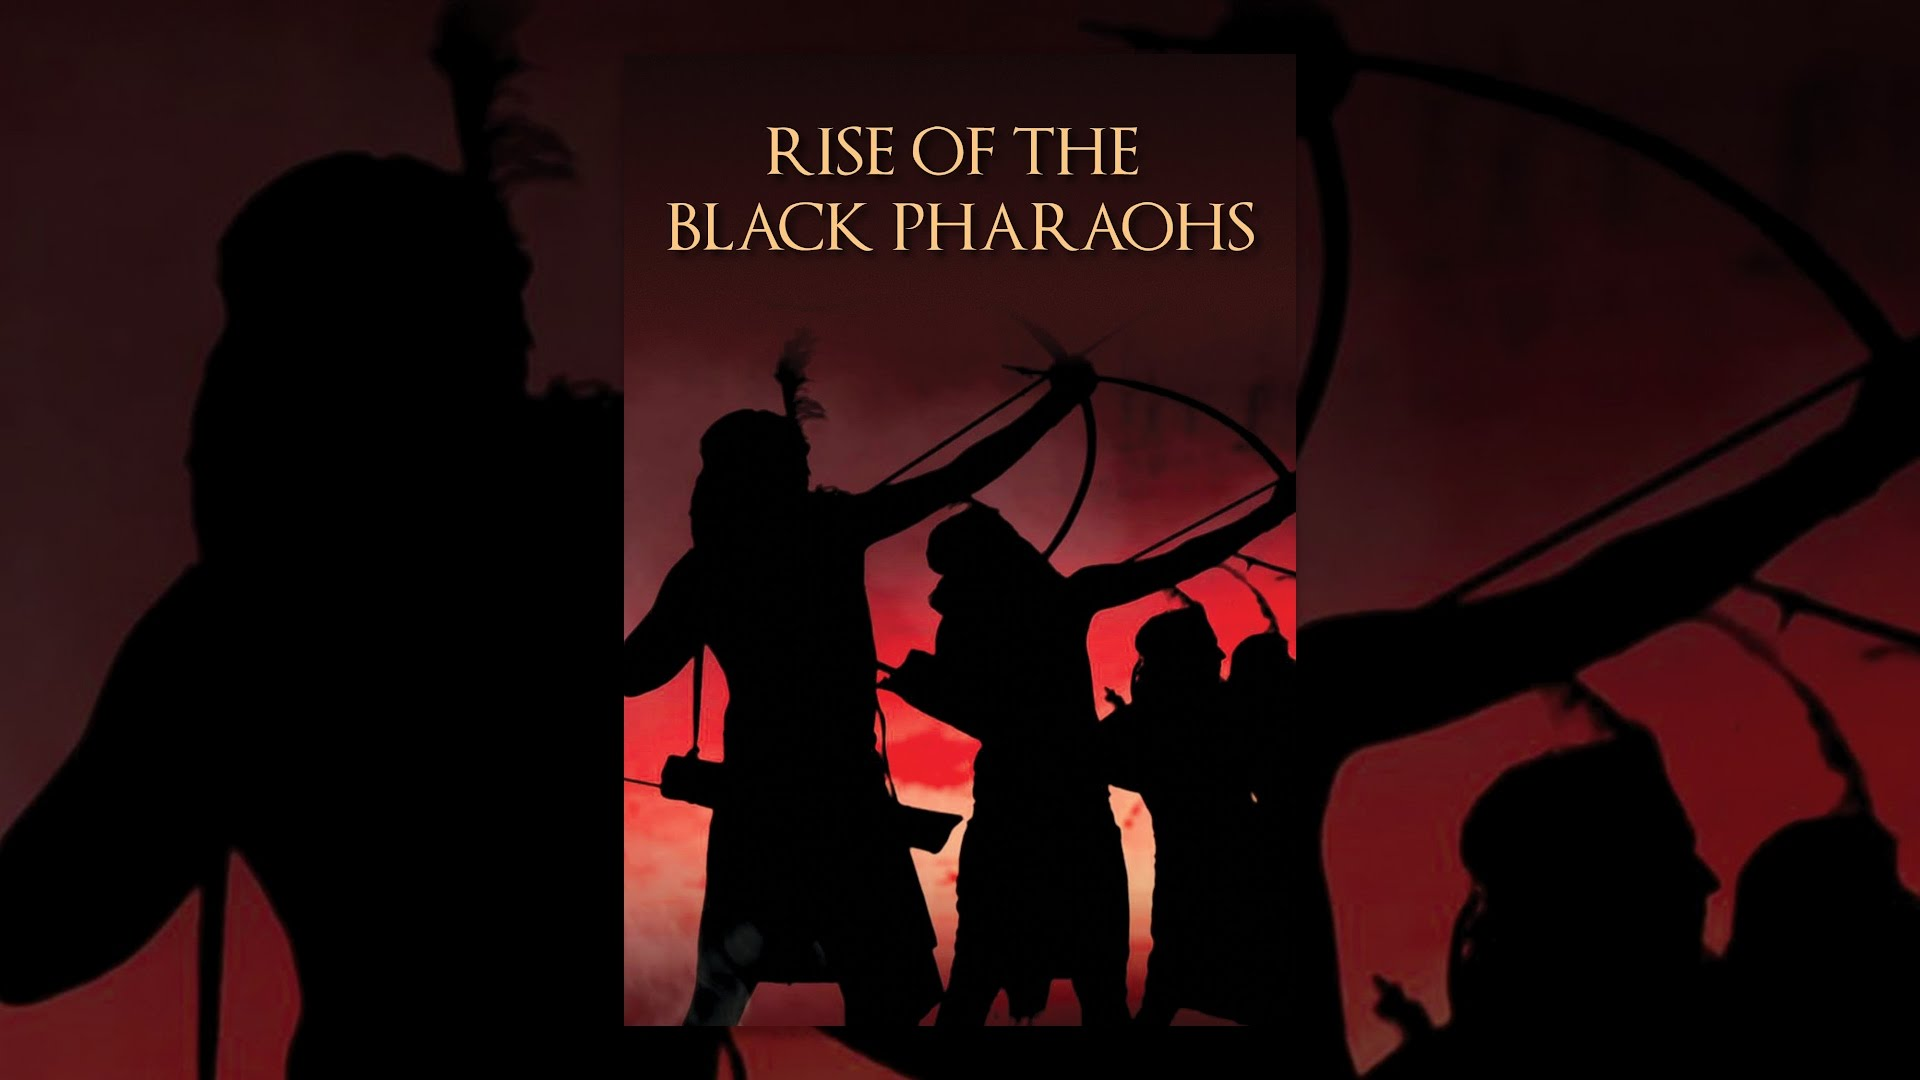 black pharaoh , black rule in egypt, African history